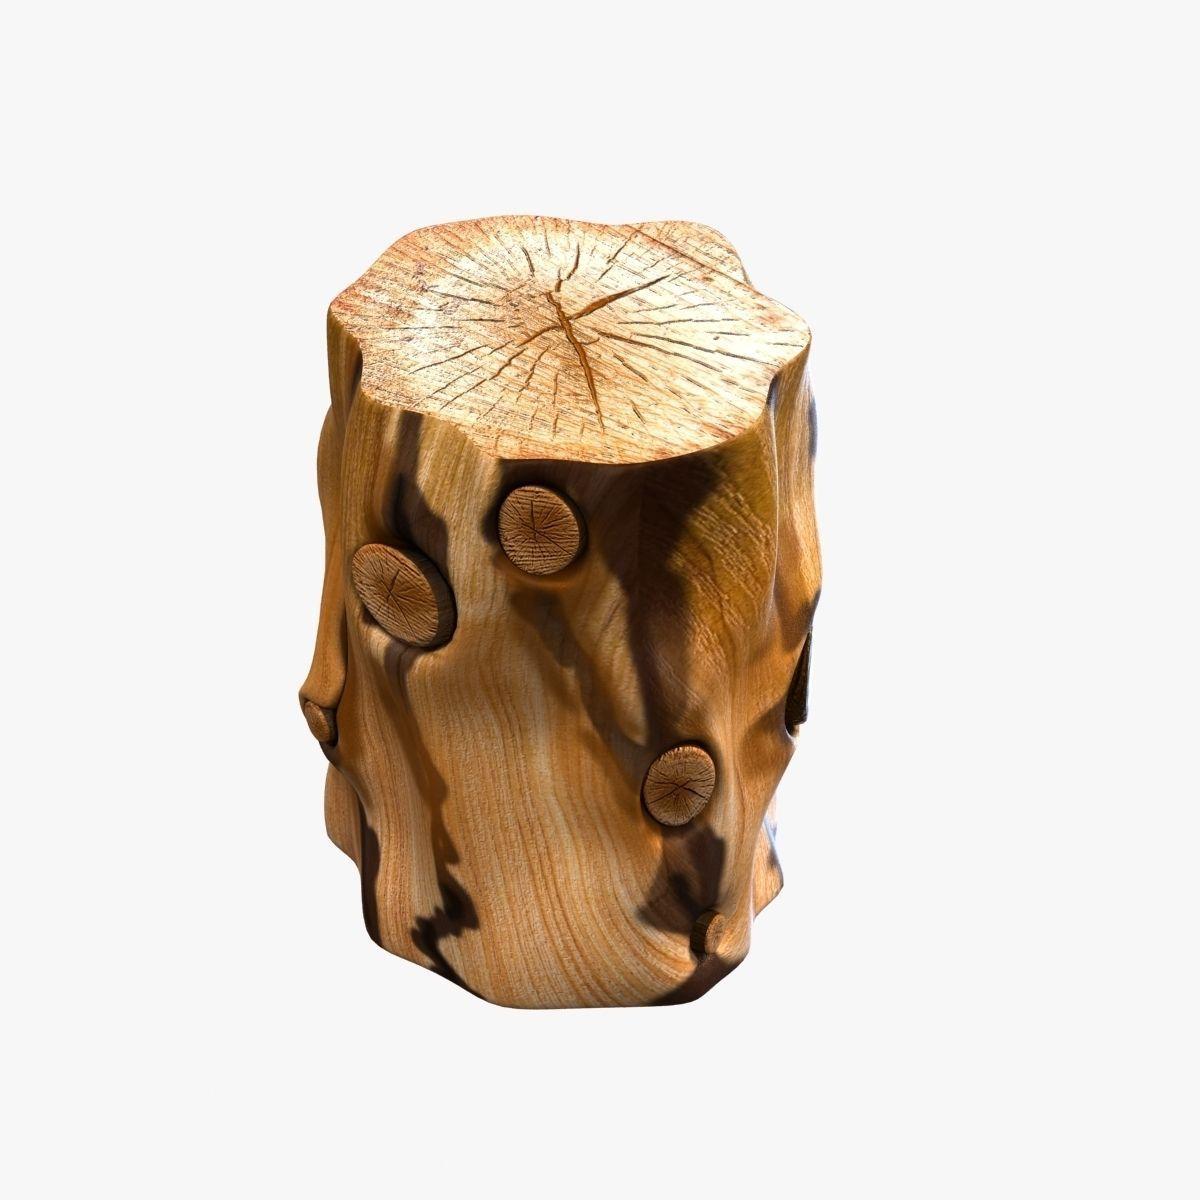 Tree stump side table -  West Elm Natural Tree Stump Side Table 3d Model Max Obj 3ds Fbx Mtl 4